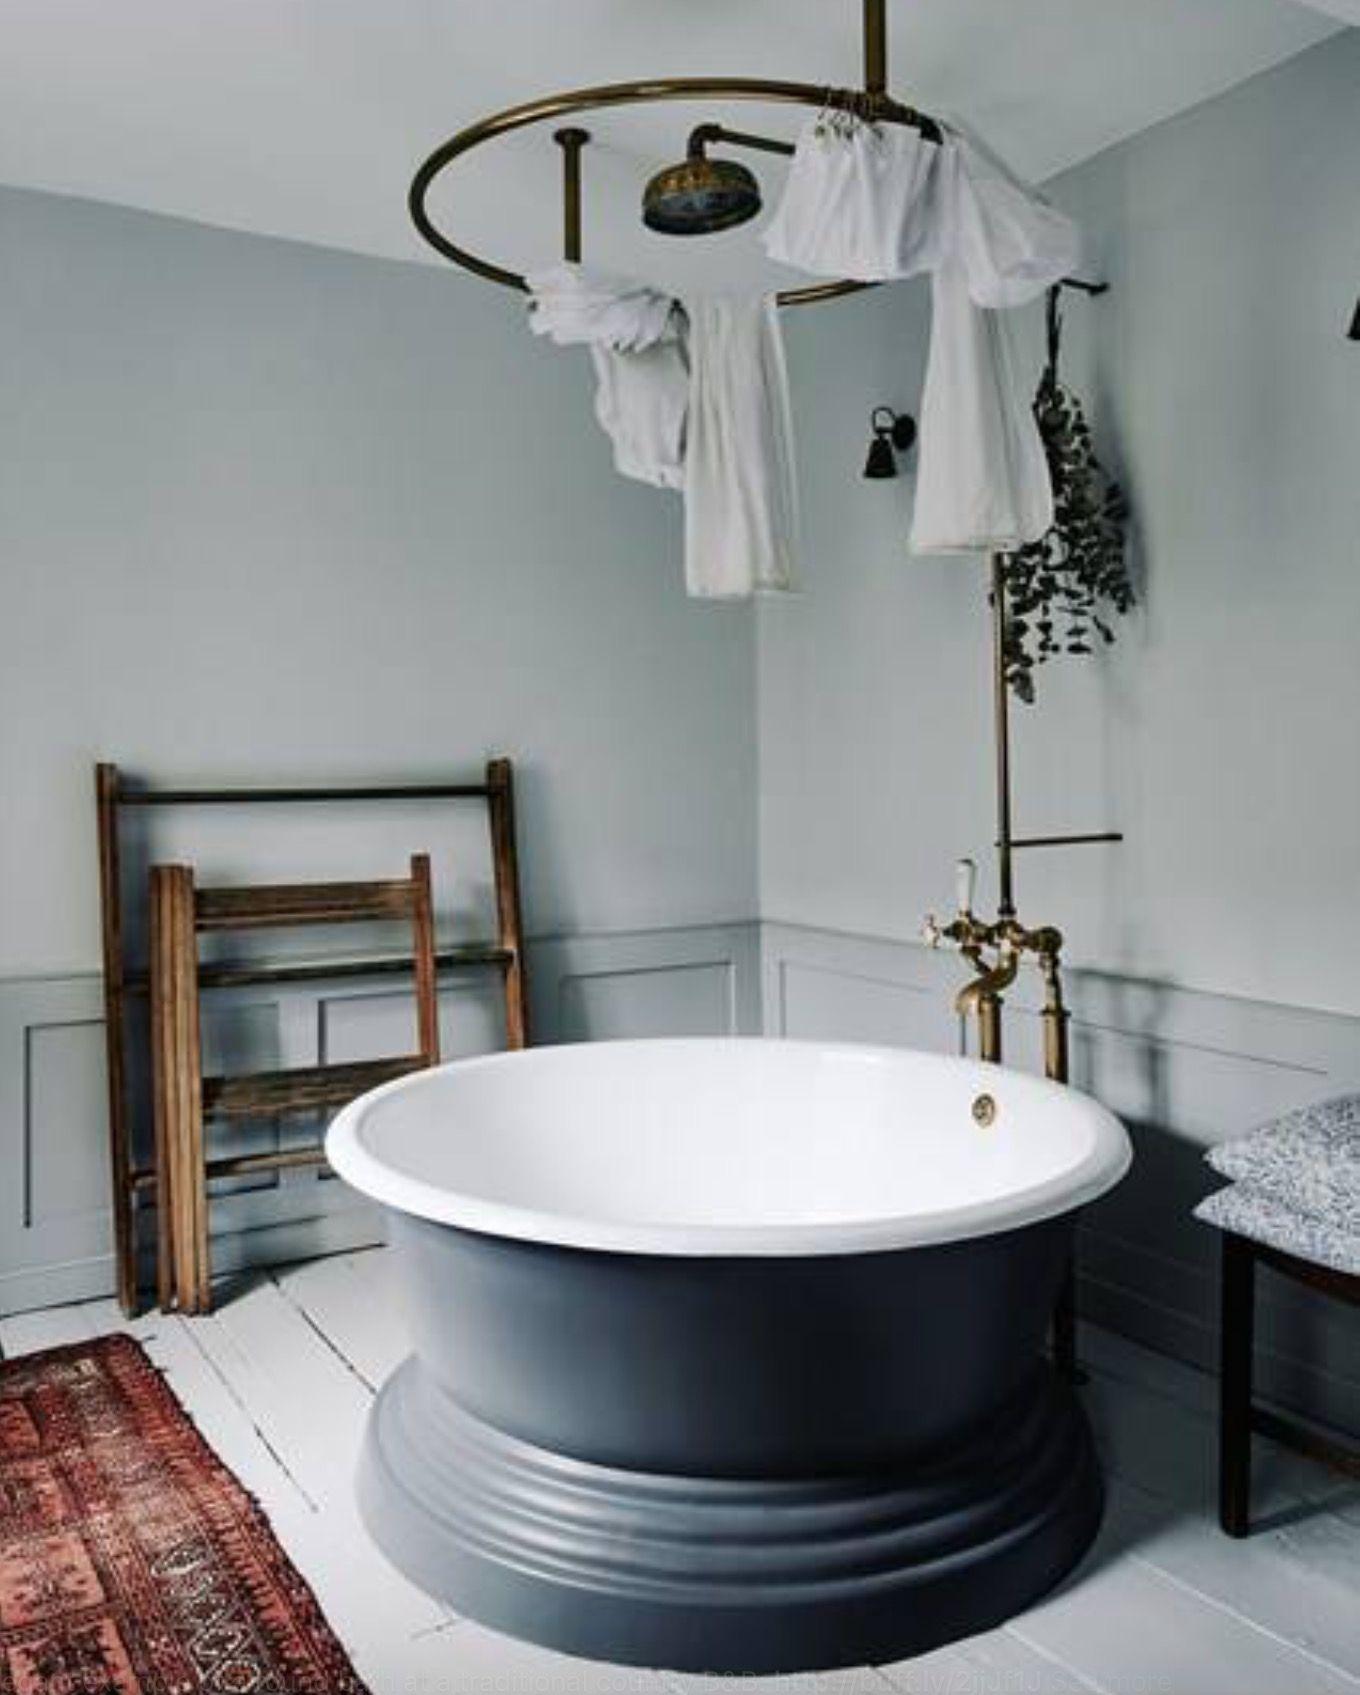 beautiful round bath  house  gardens  bathroom inspiration  - beautiful round bath  house  gardens  bathroom inspiration